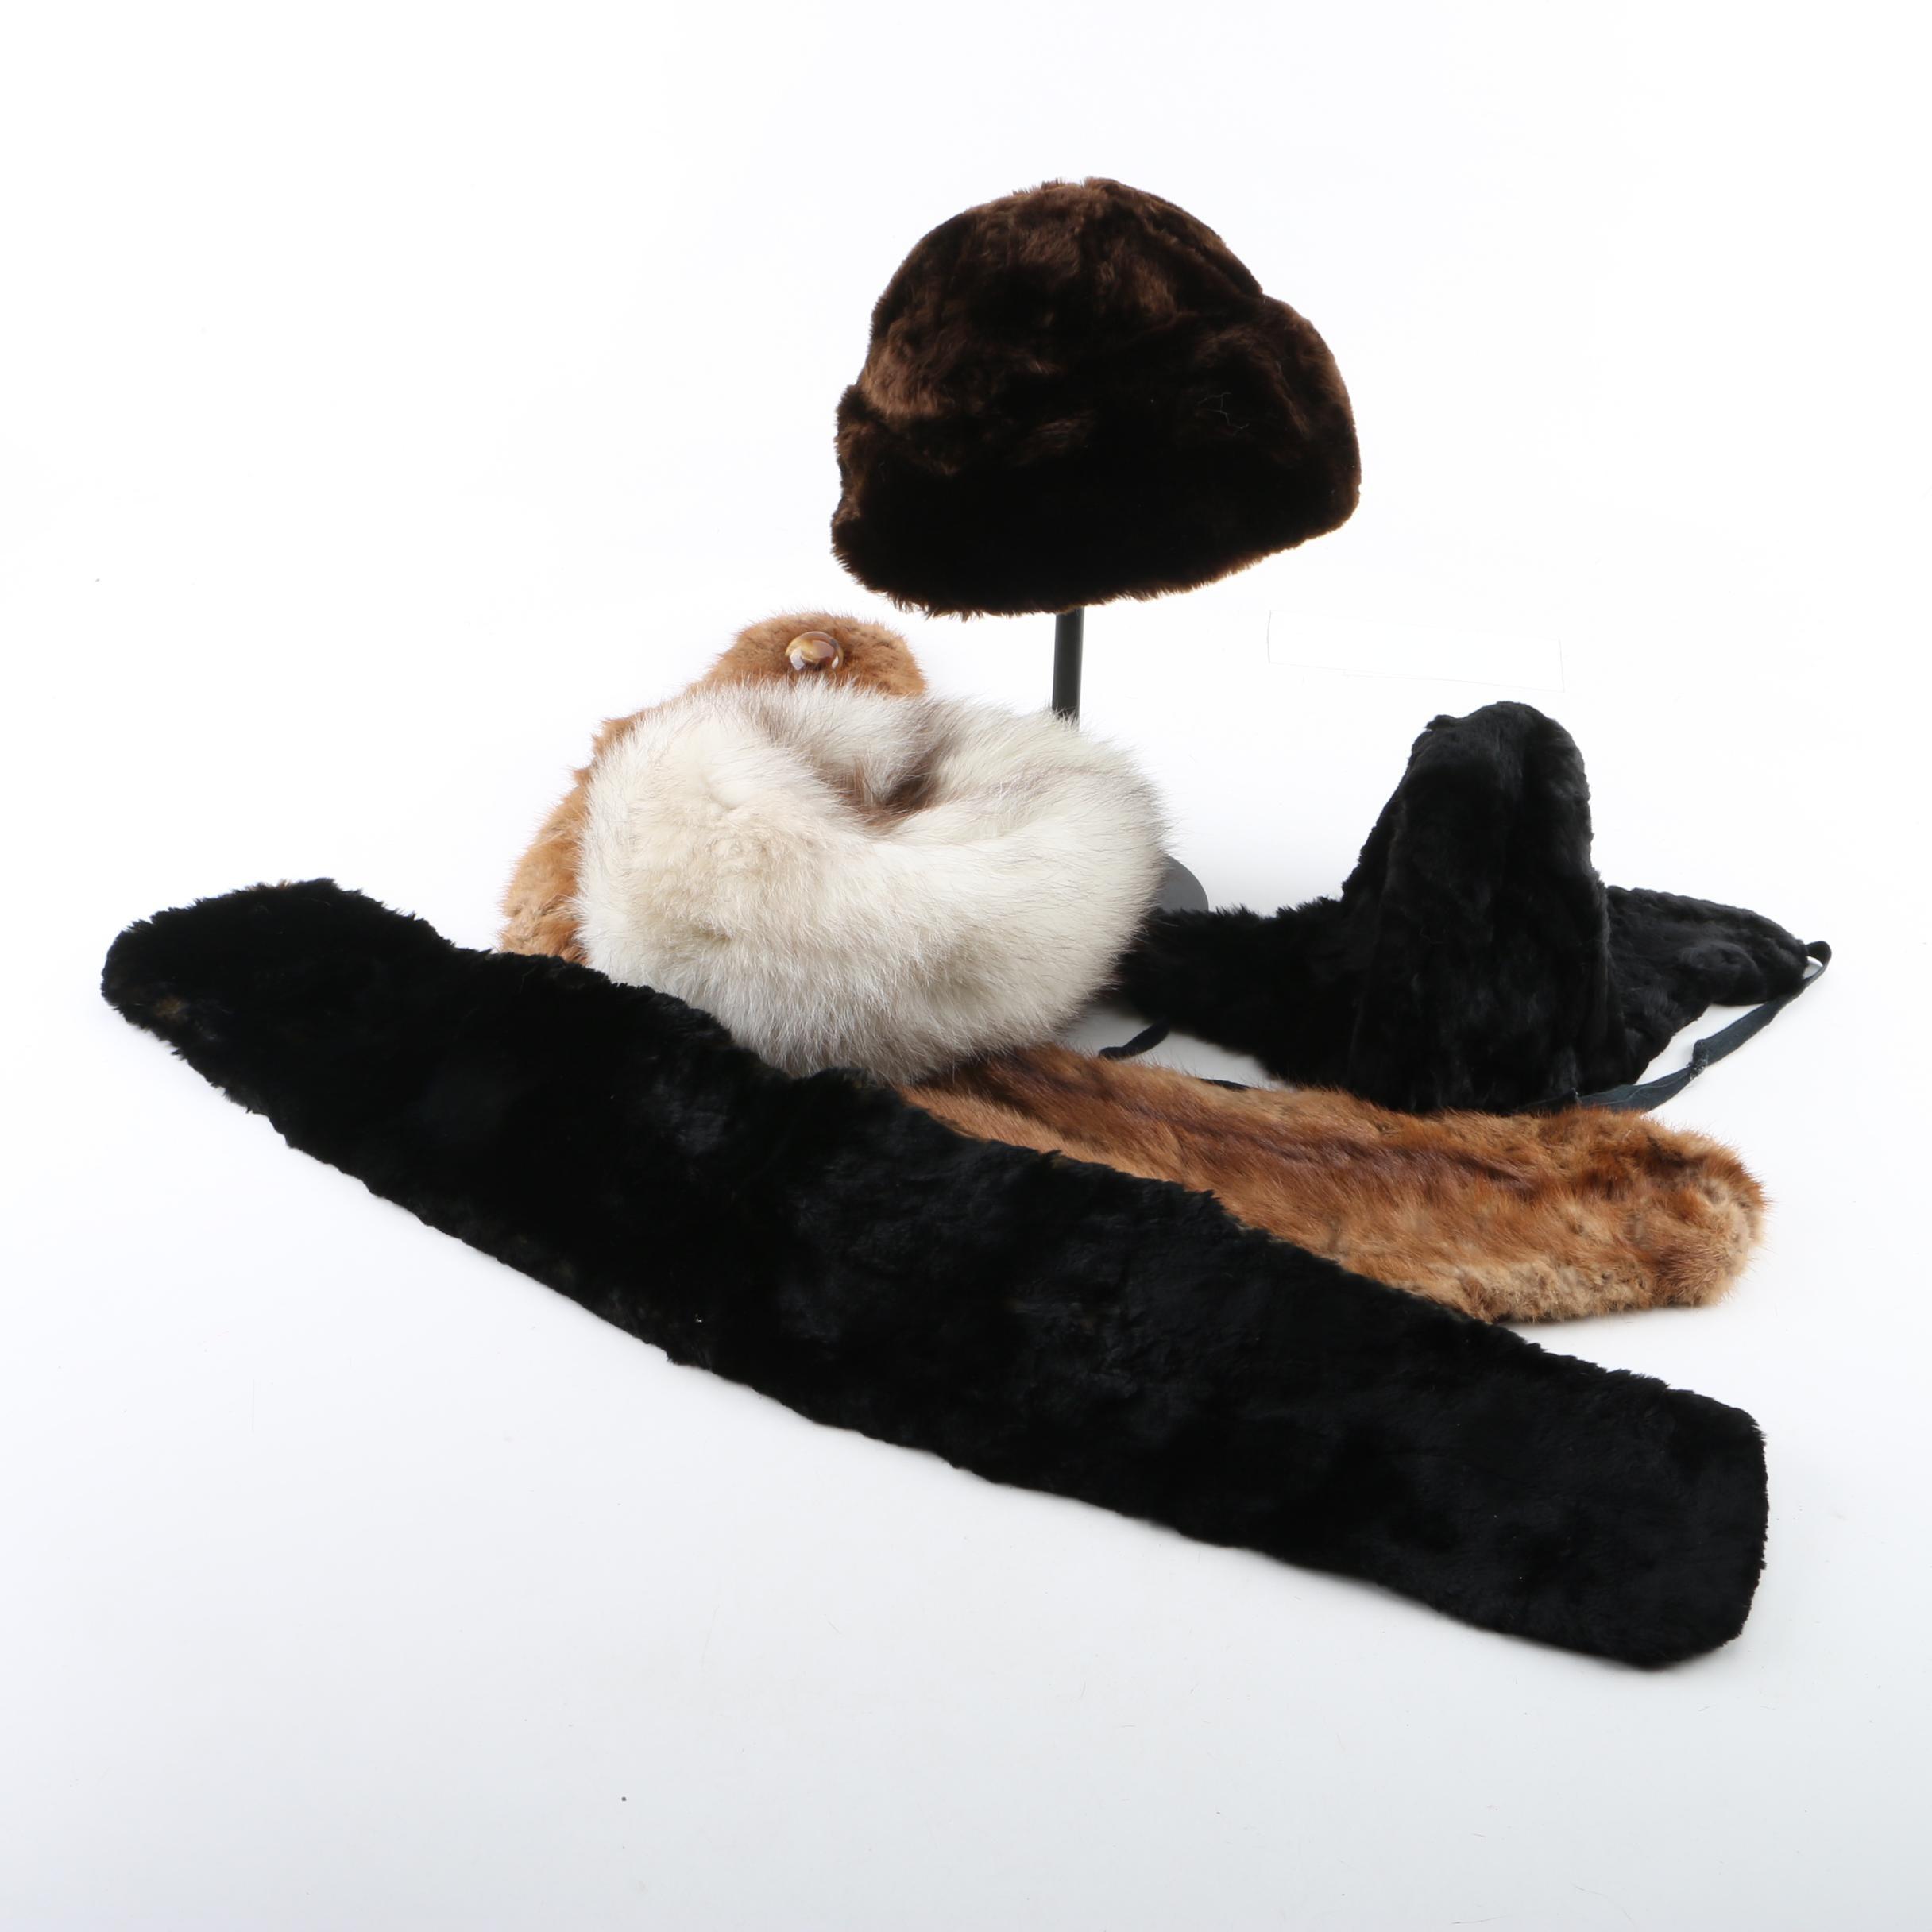 Vintage Collars and Hats in Marten Fur, Beaver Fur and Fox Fur